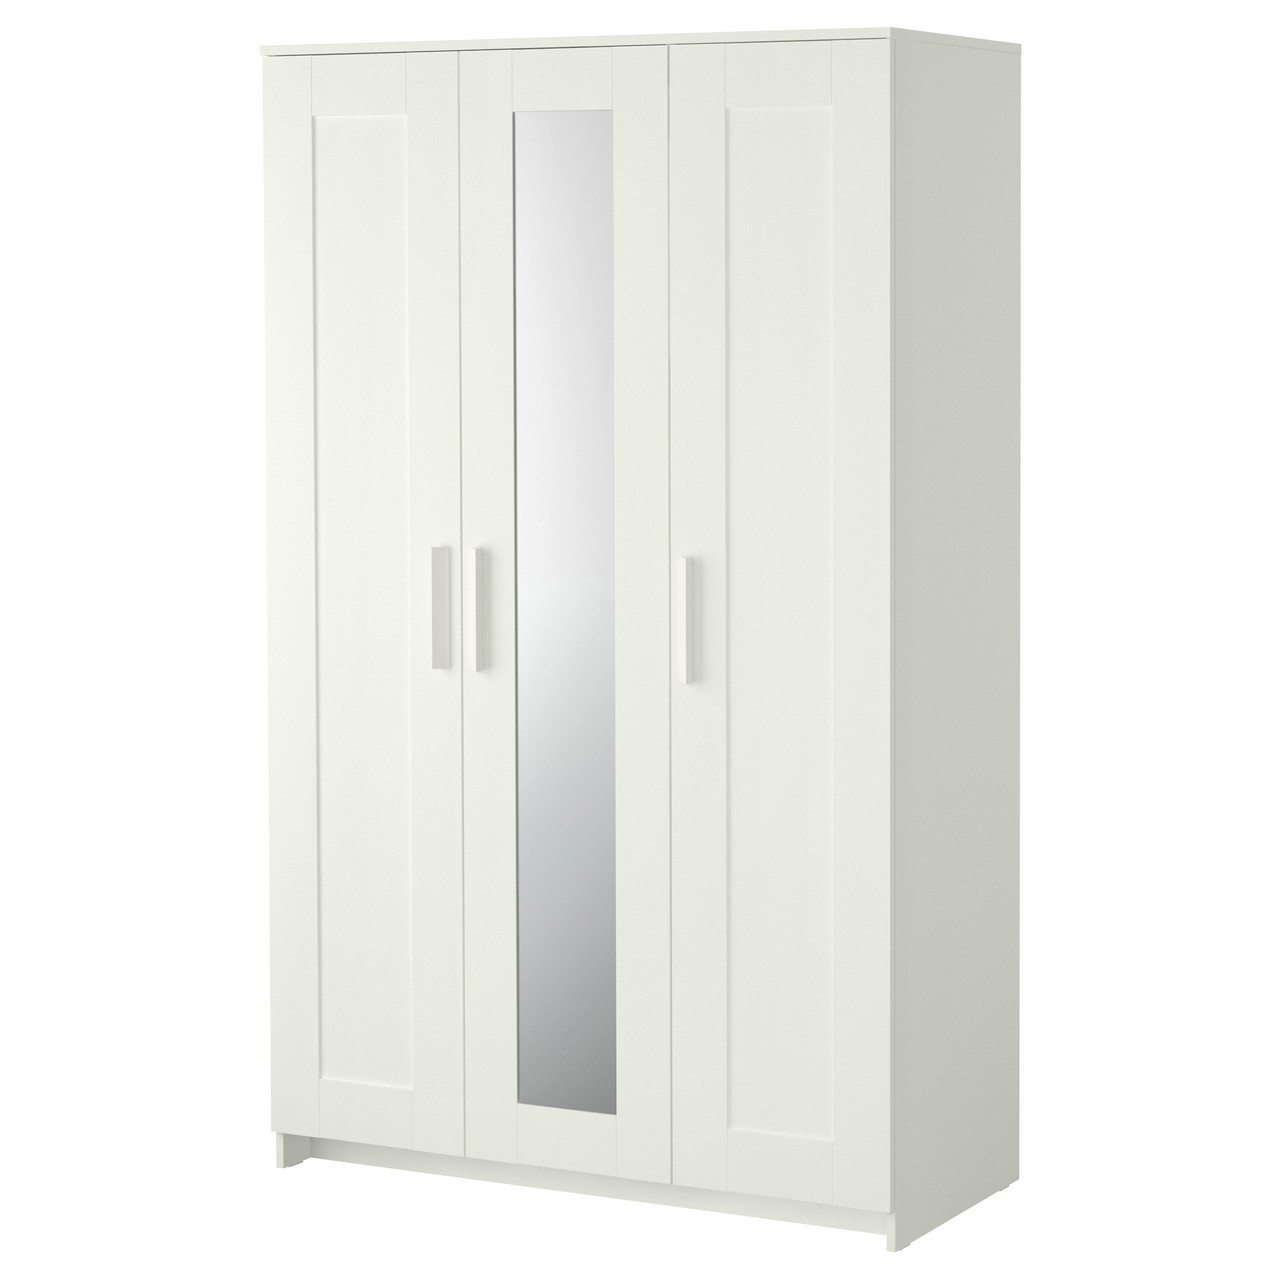 BRIMNES Шкаф-купе/3 двери, белый 702.458.53